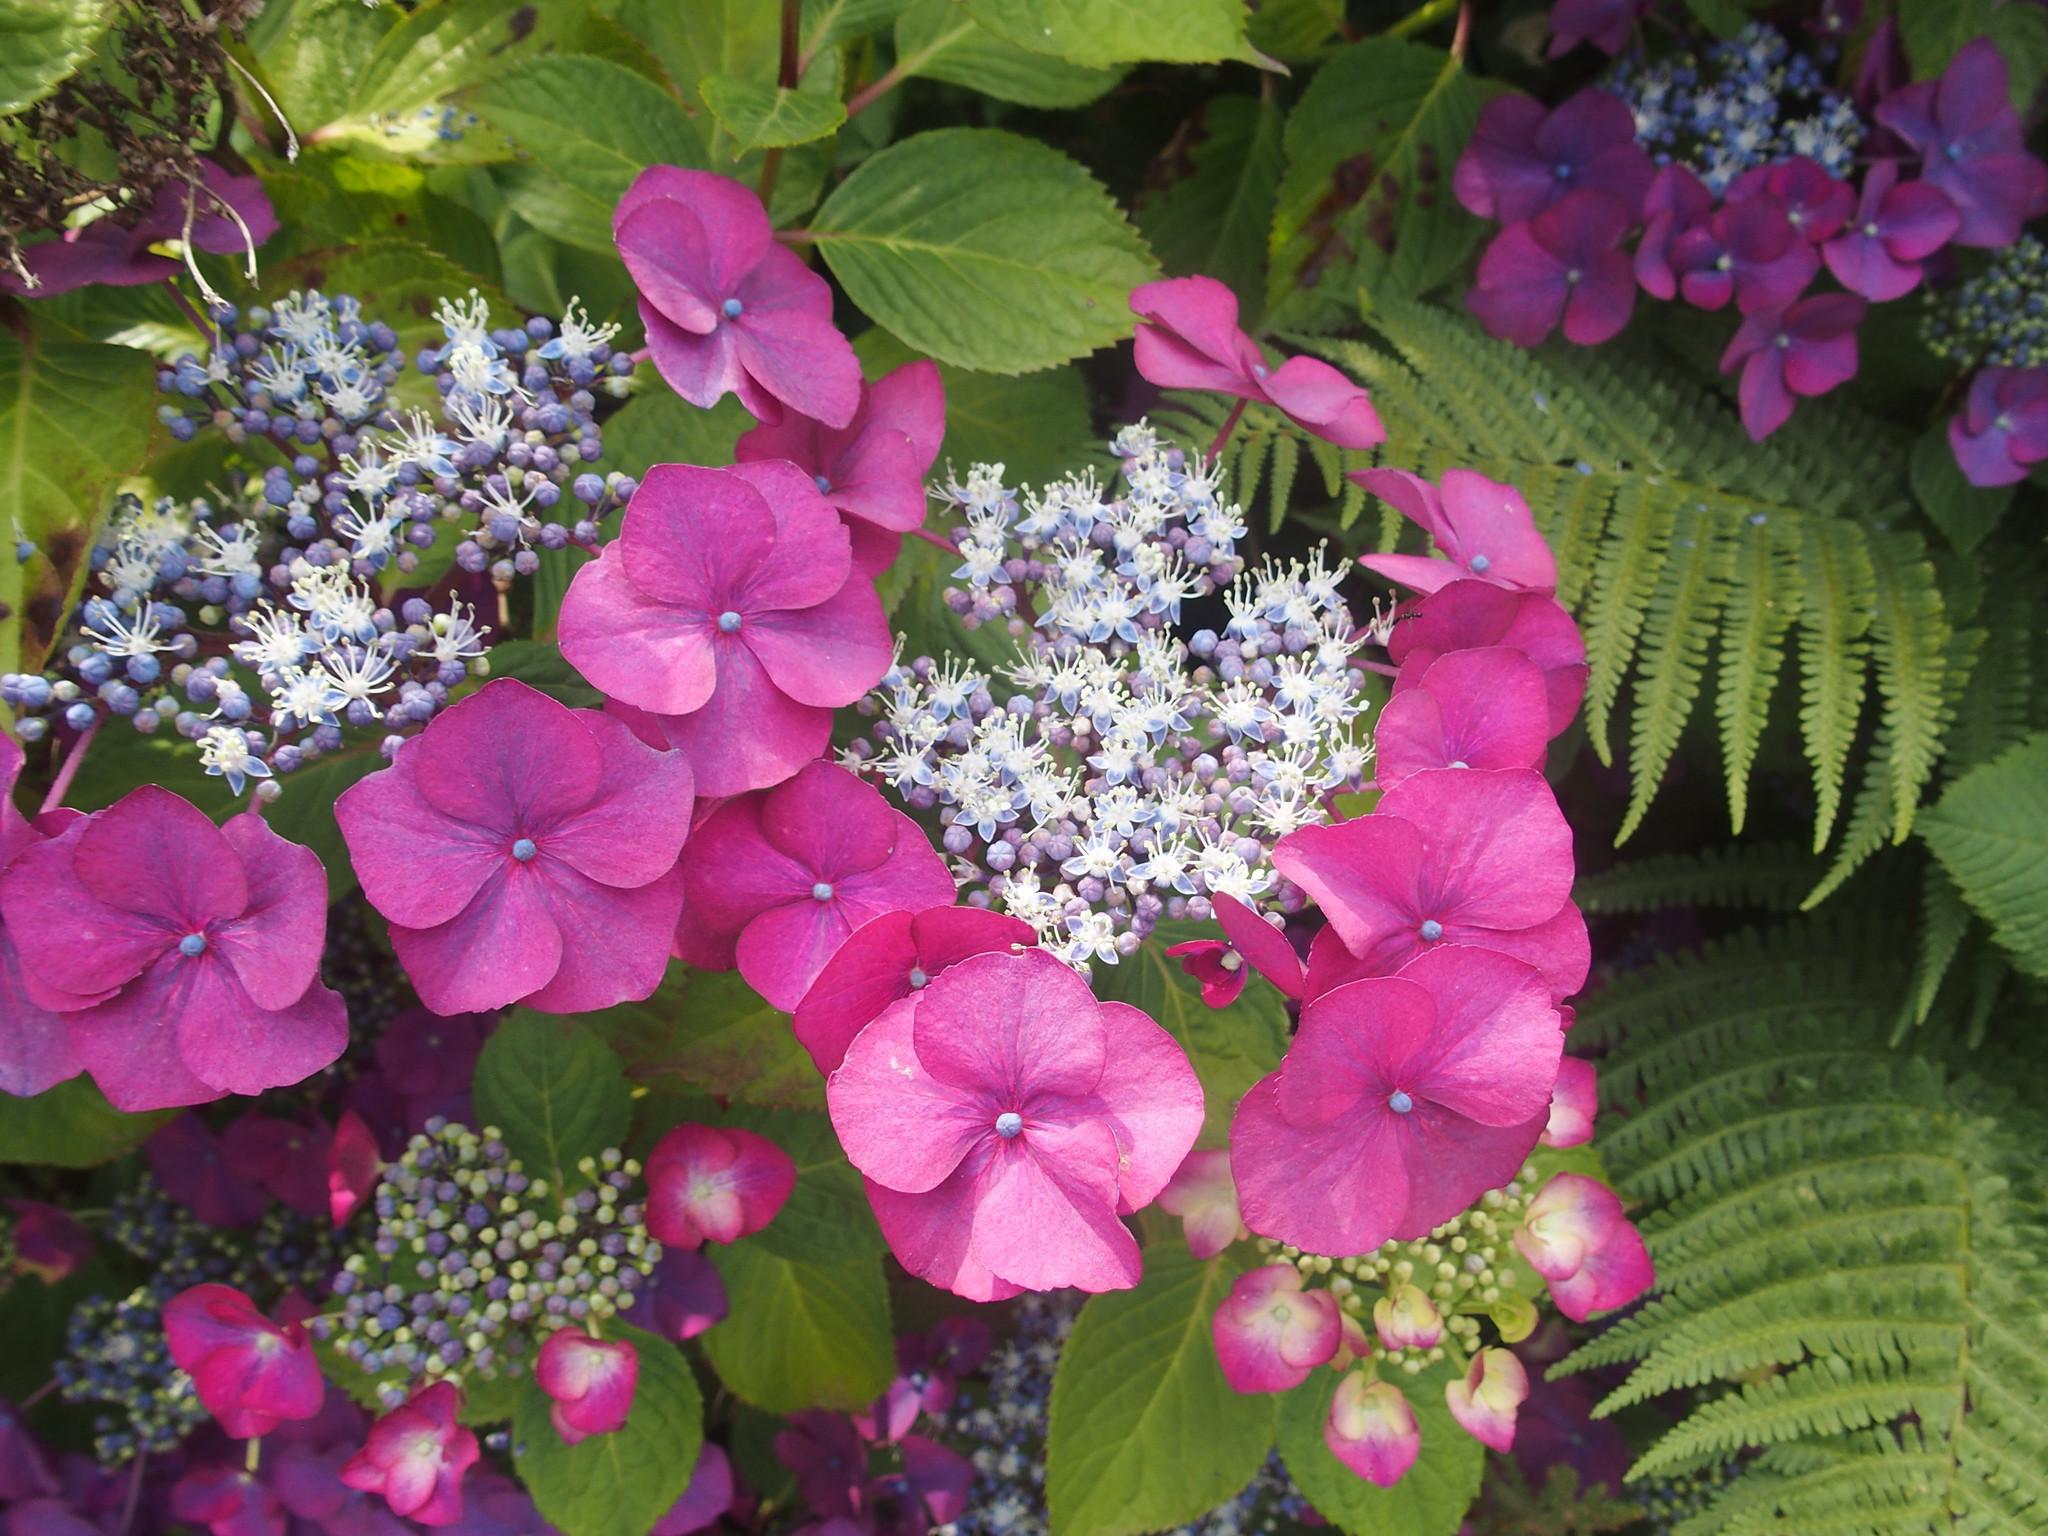 Hortensia blomman